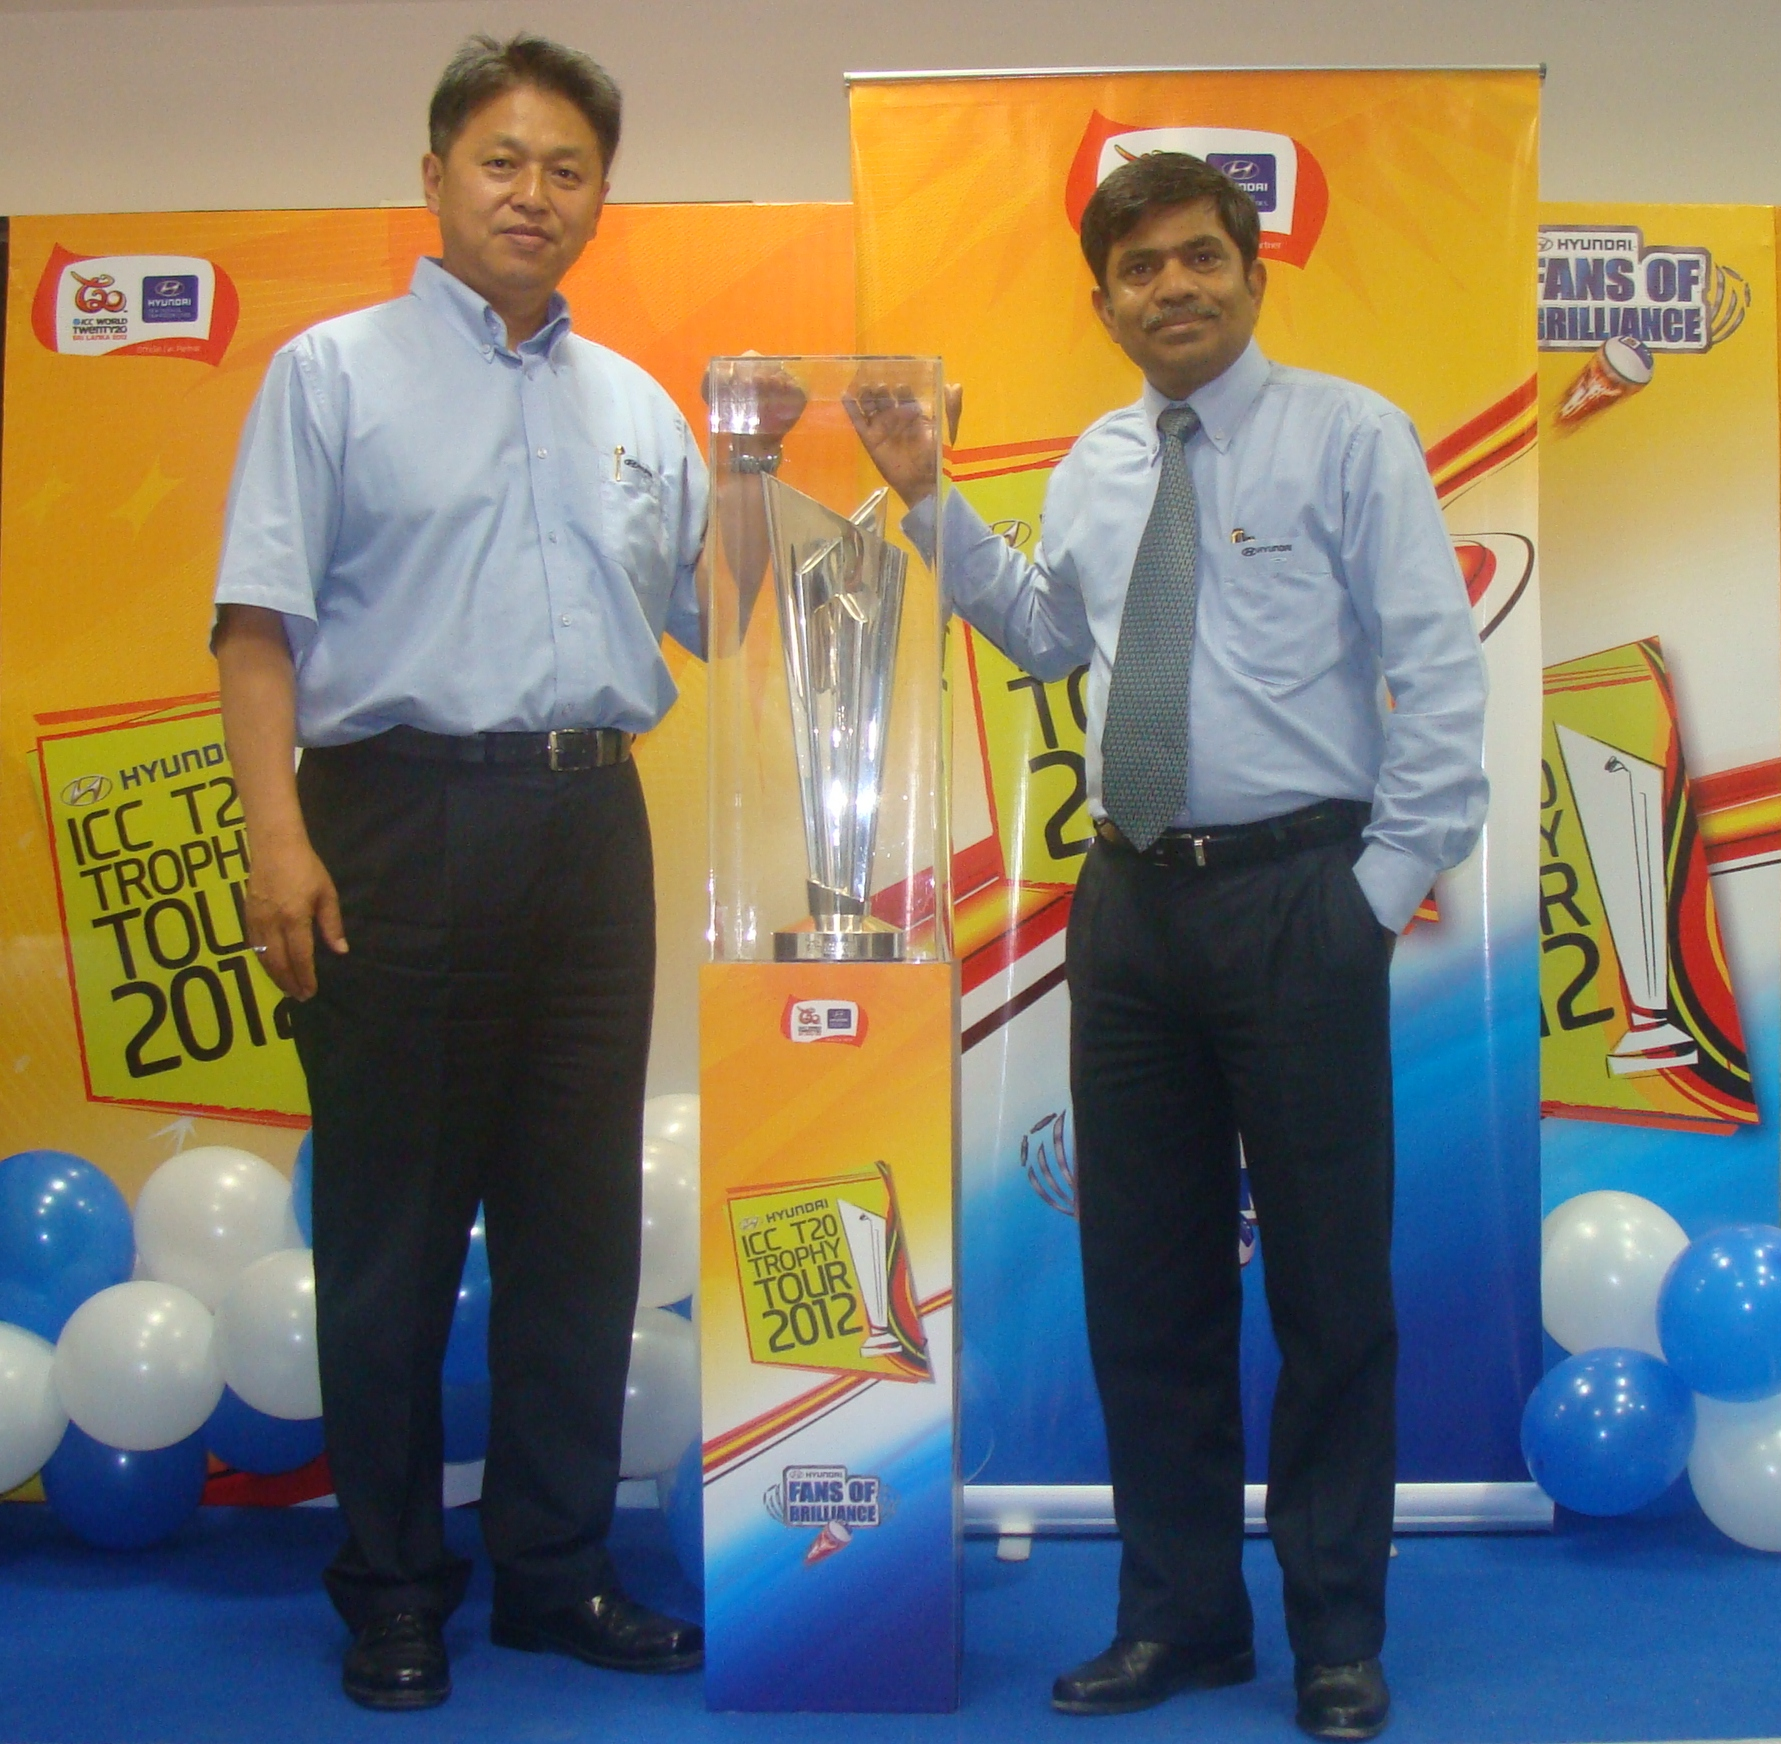 Mr-C-H-Han-ED-HMIL-and-Mr-Rakesh-Srivastava-VP-National-Sales-HMIL